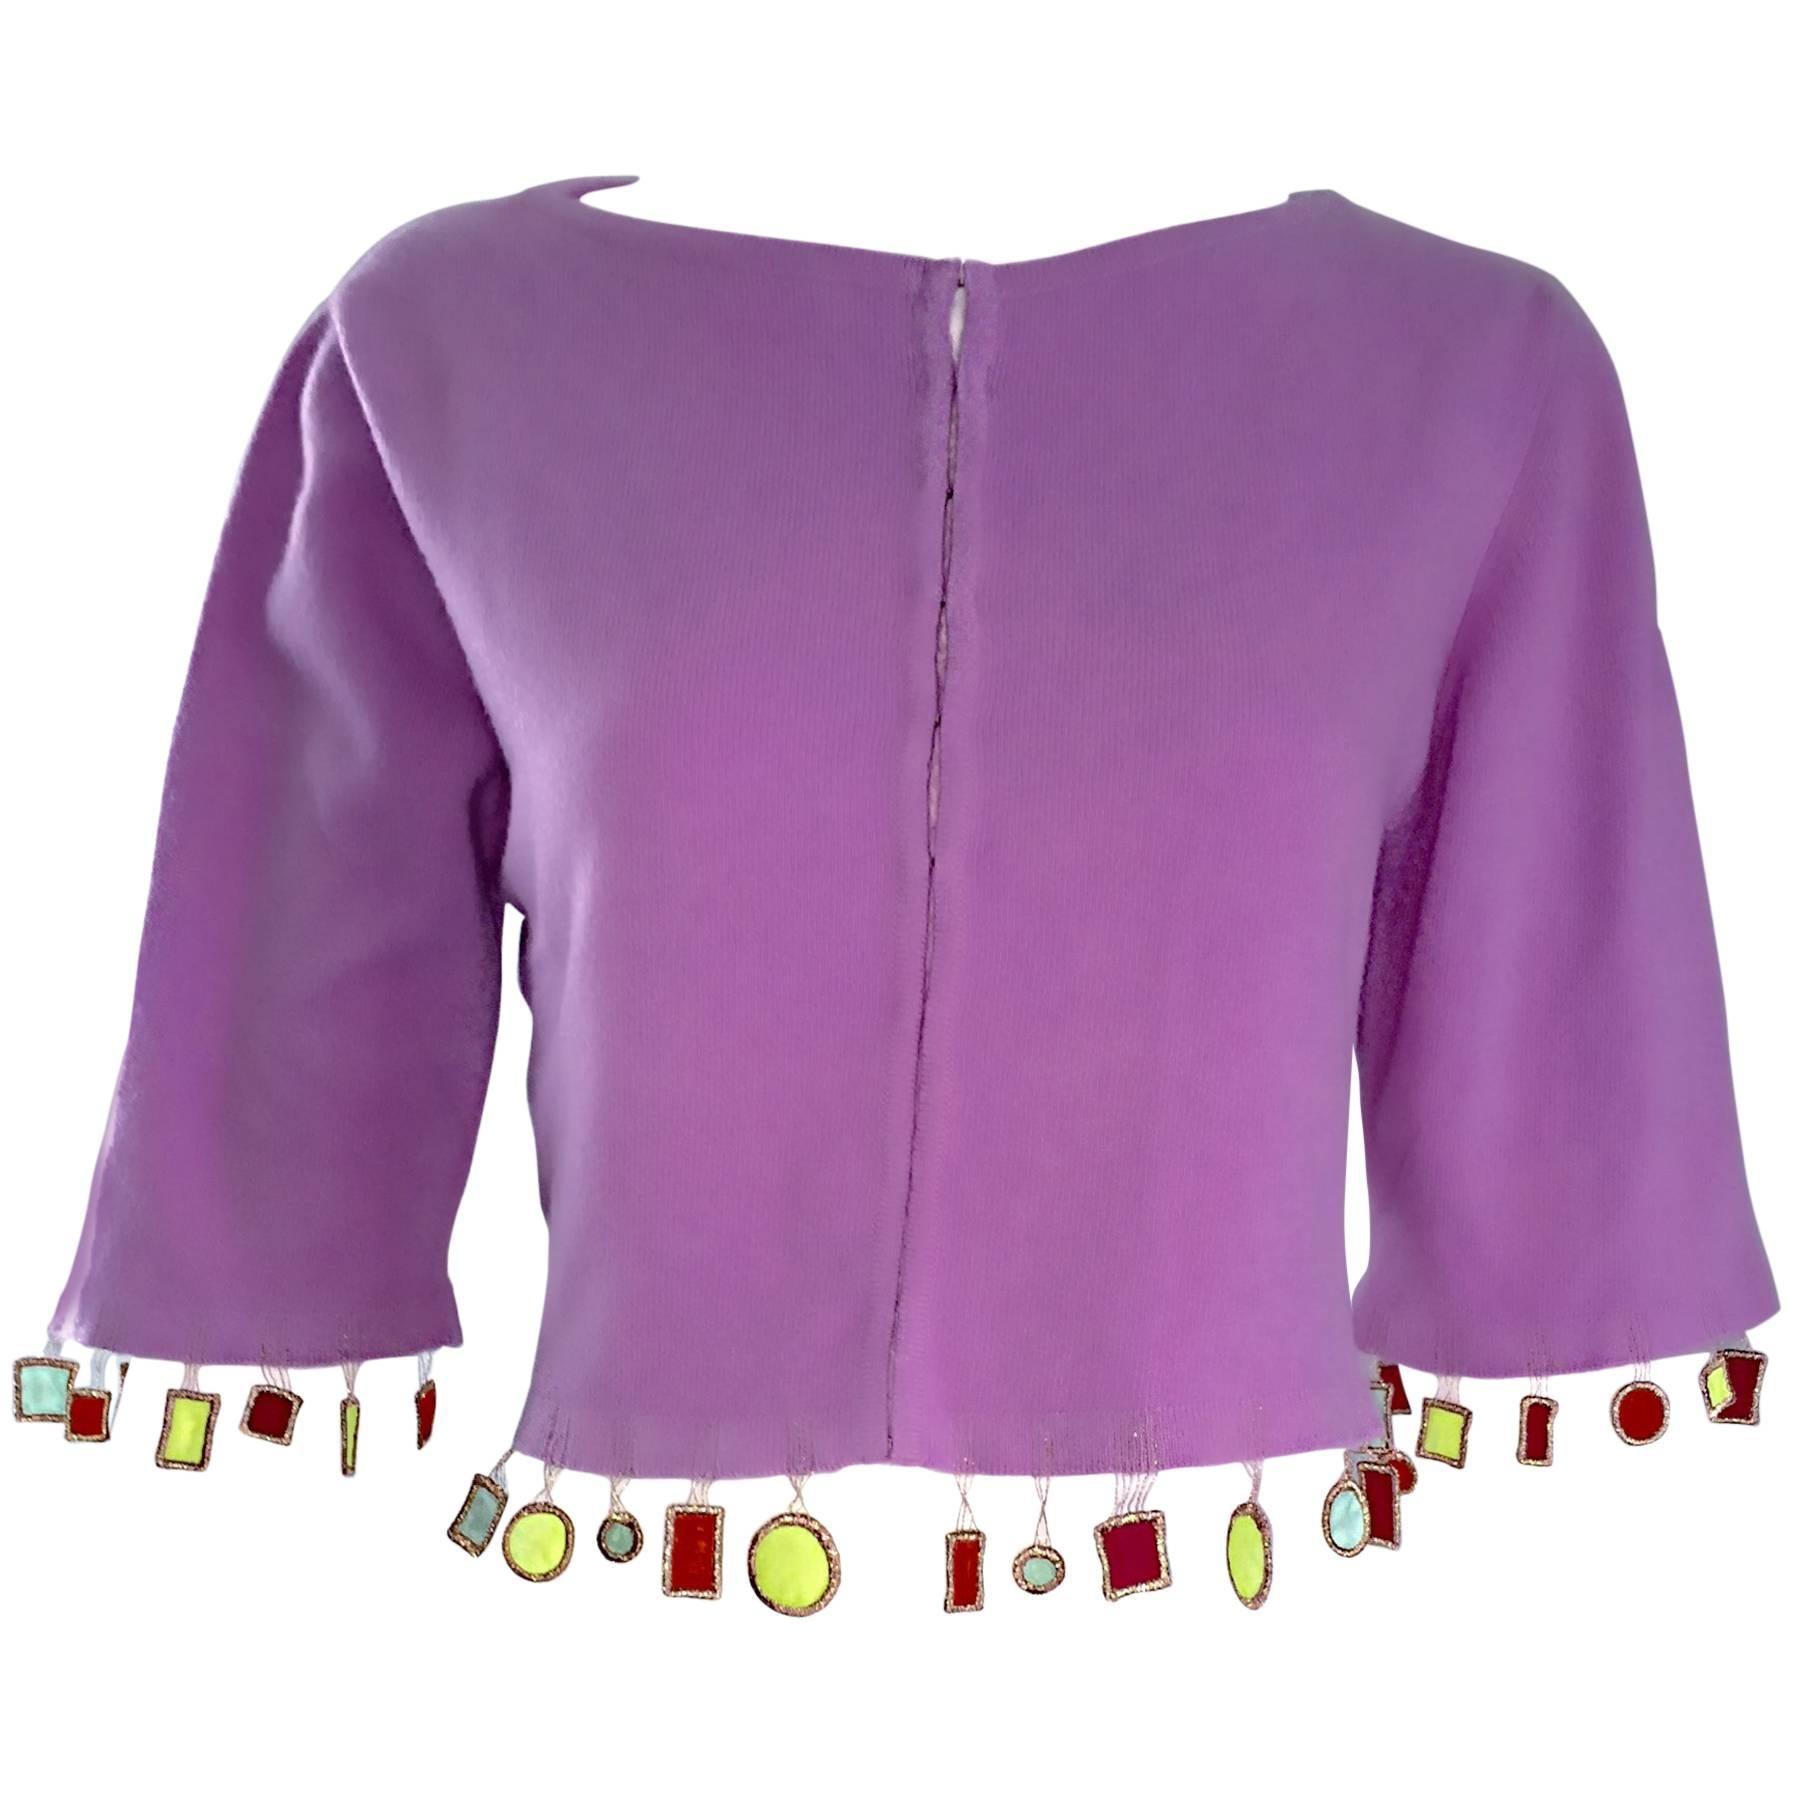 Mathew Williamson Whimsical Lilac Purple Cashmere 3/4 Sleeve Cropped Cardigan